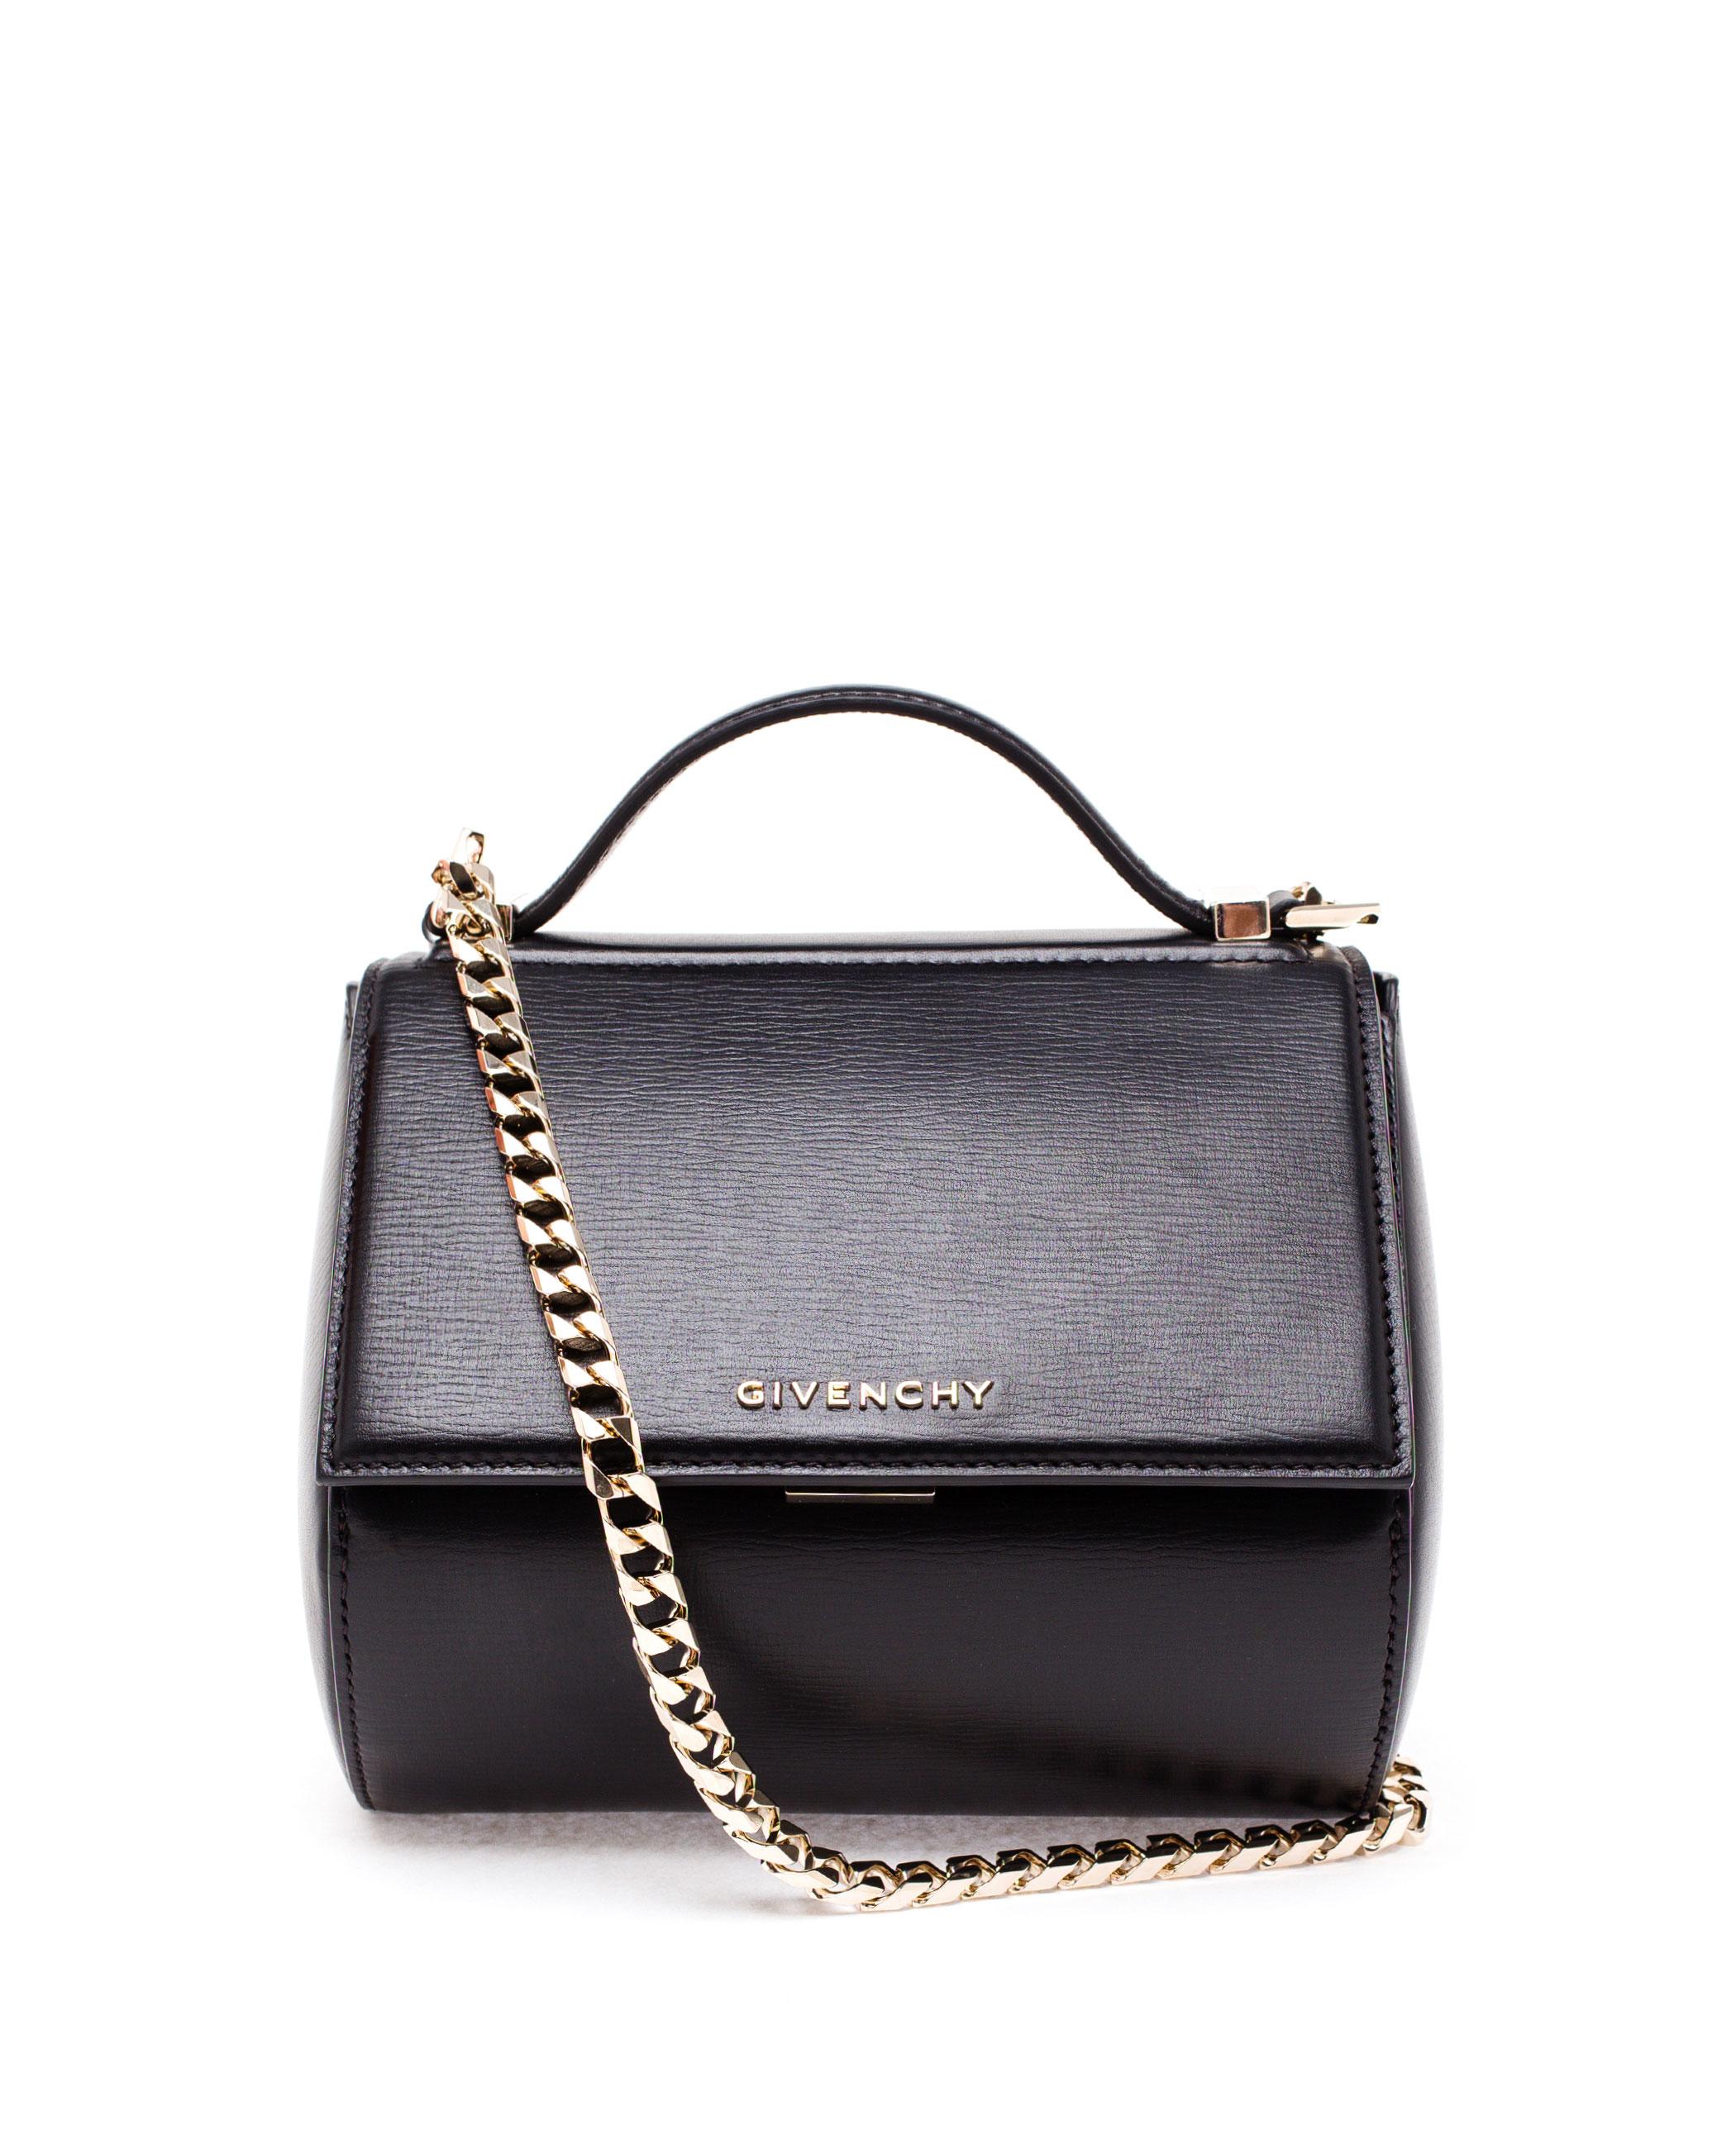 a5ad2e9d5c14c Givenchy Mini Leather Pandora Box Bag in Black - Lyst